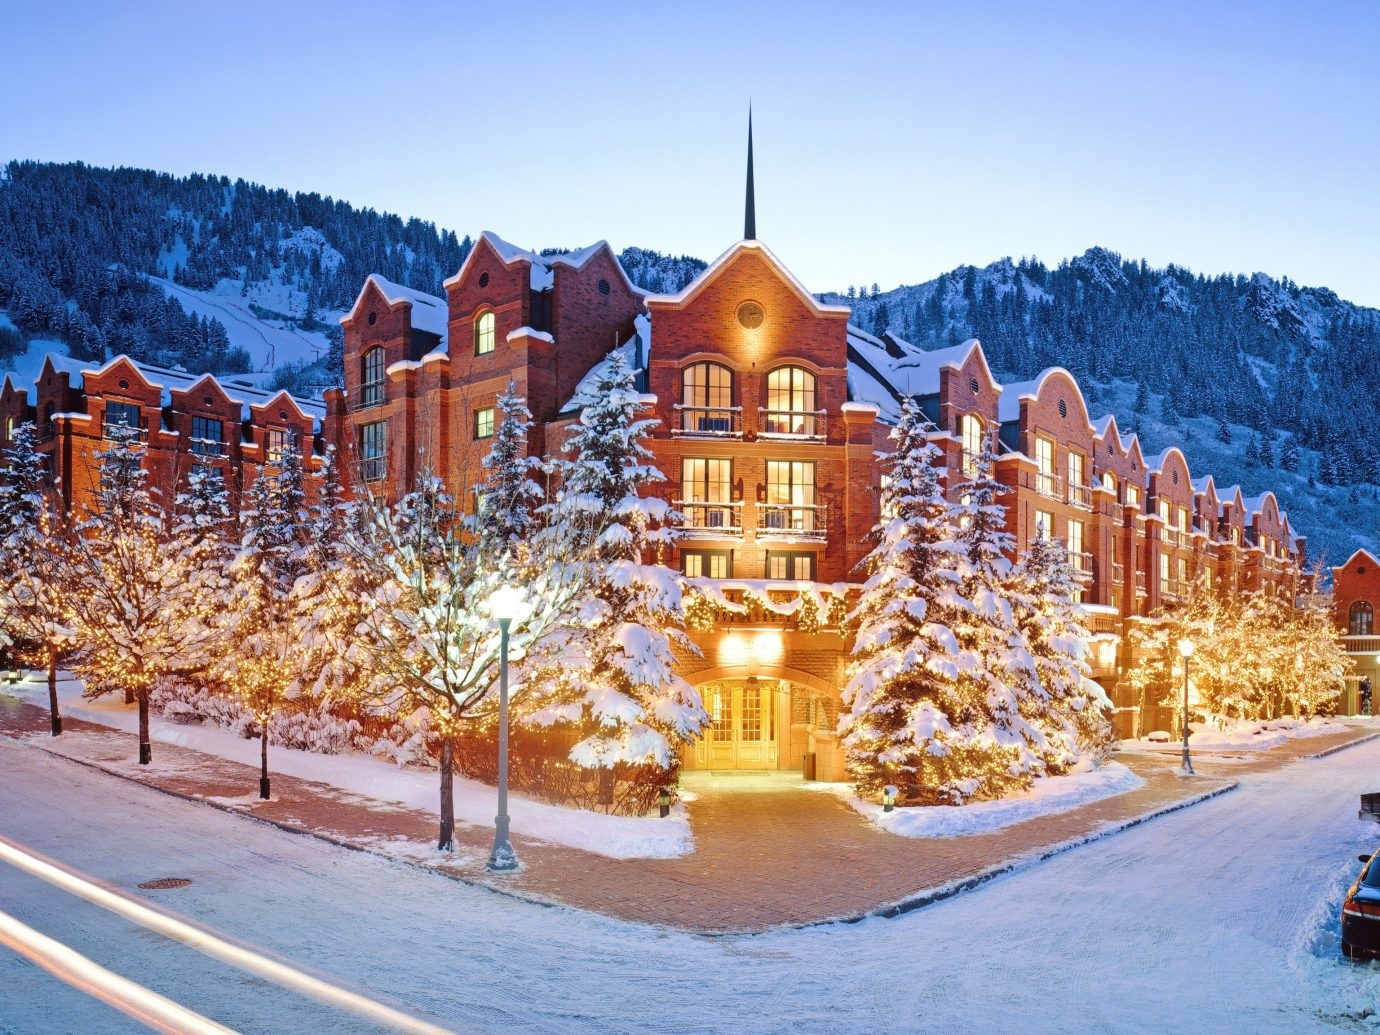 Hotels sky outdoor Winter snow landmark season Resort christmas decoration